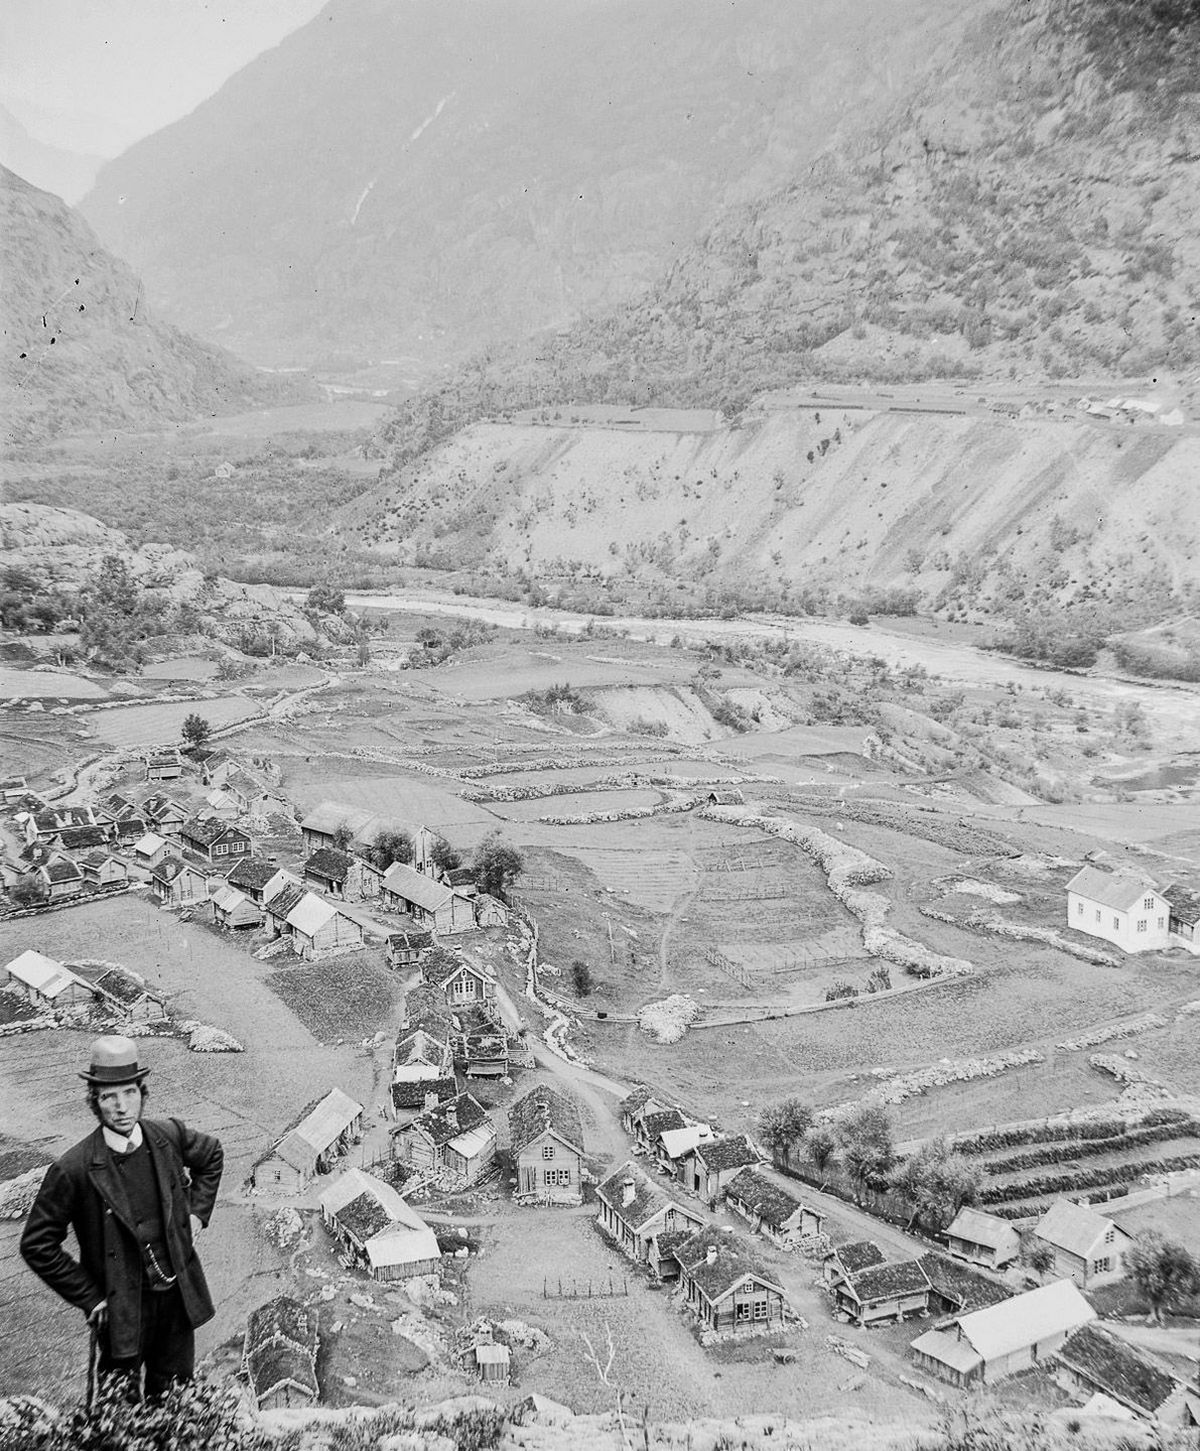 Люди Согндала 1900 Норвегия 14